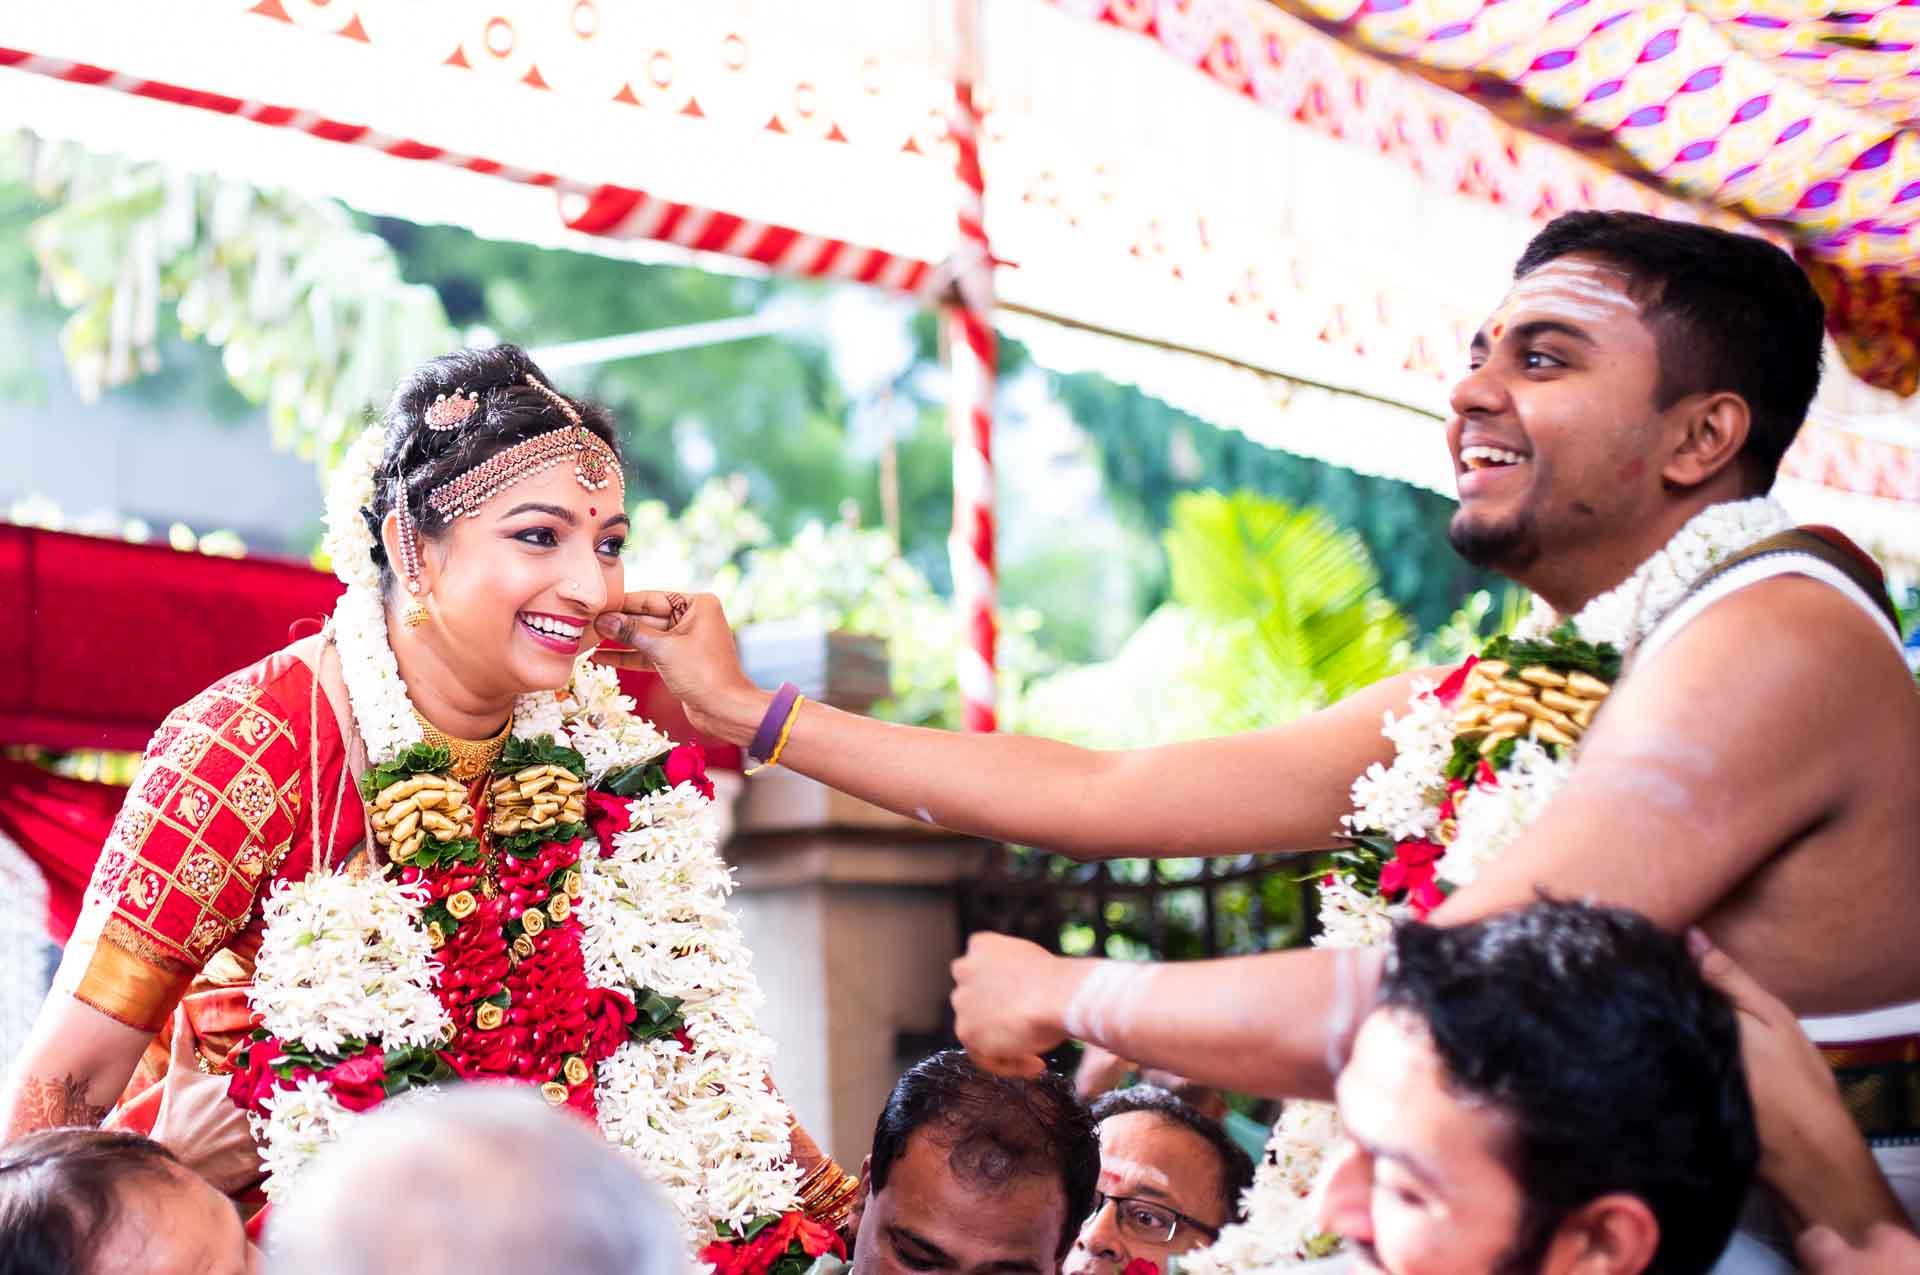 girish joshi wedding photographer in pune mumbai mahabaleshwar